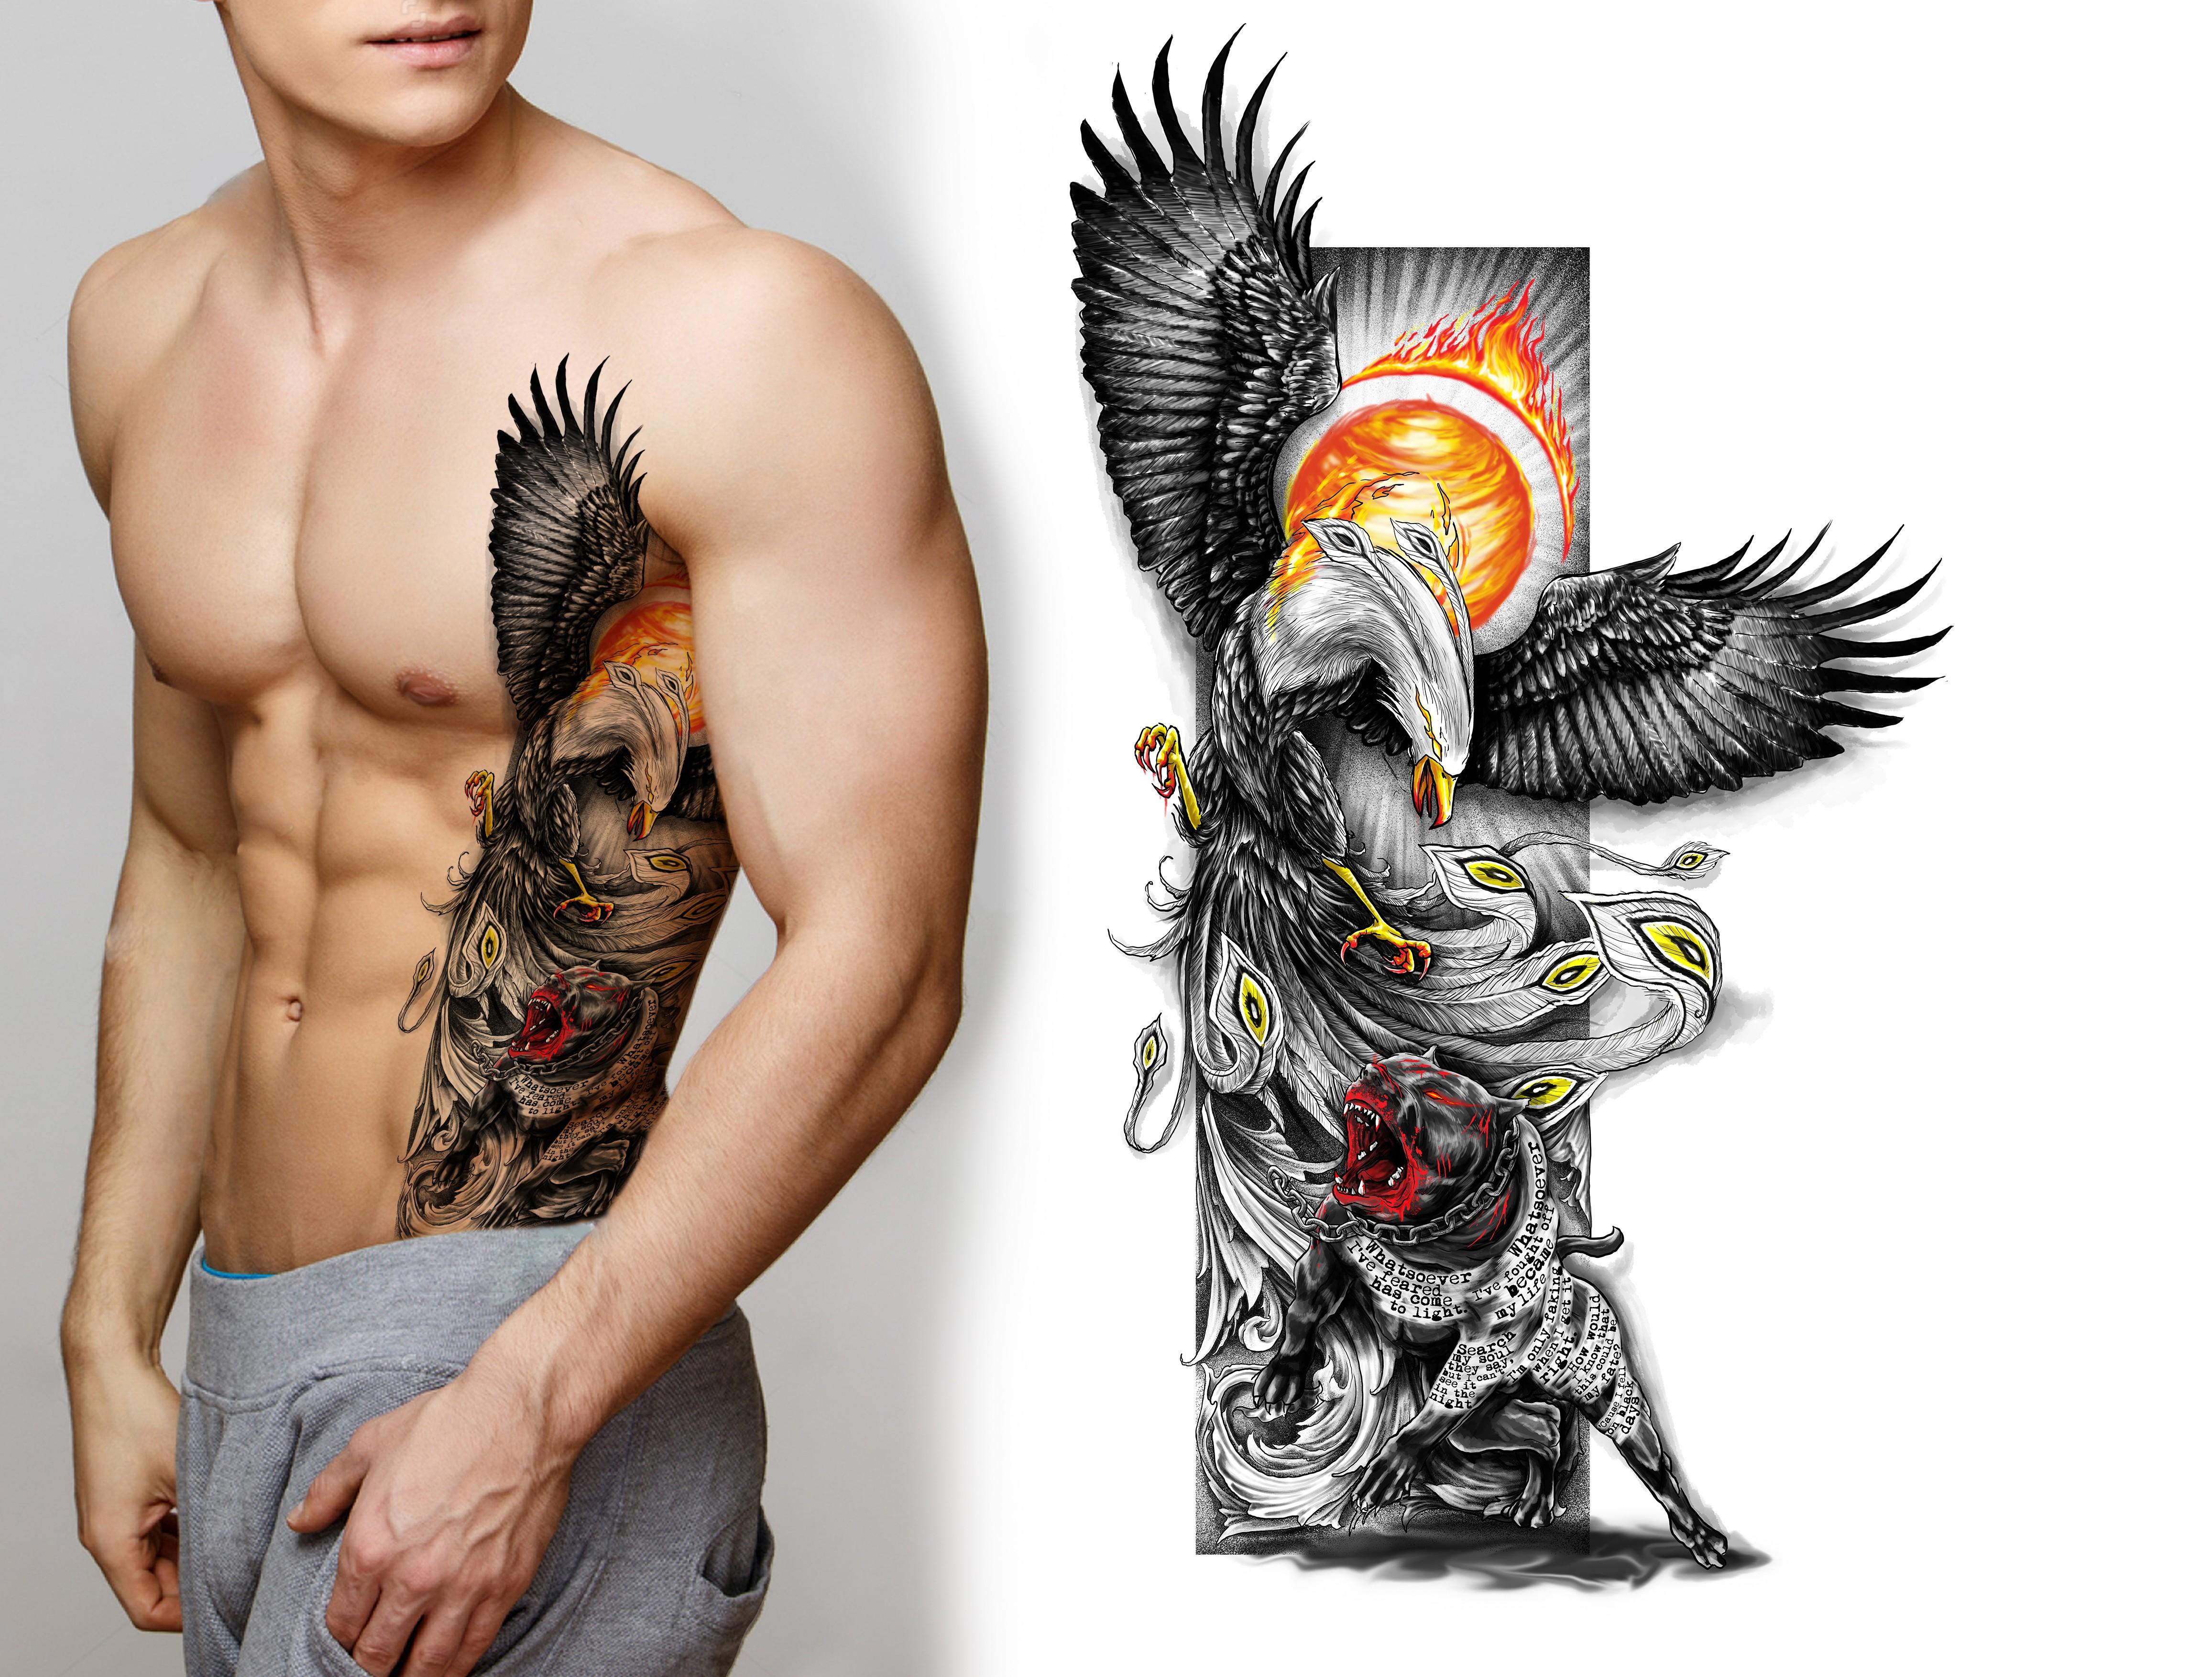 Black dog (pitbull) into a rising phoenix